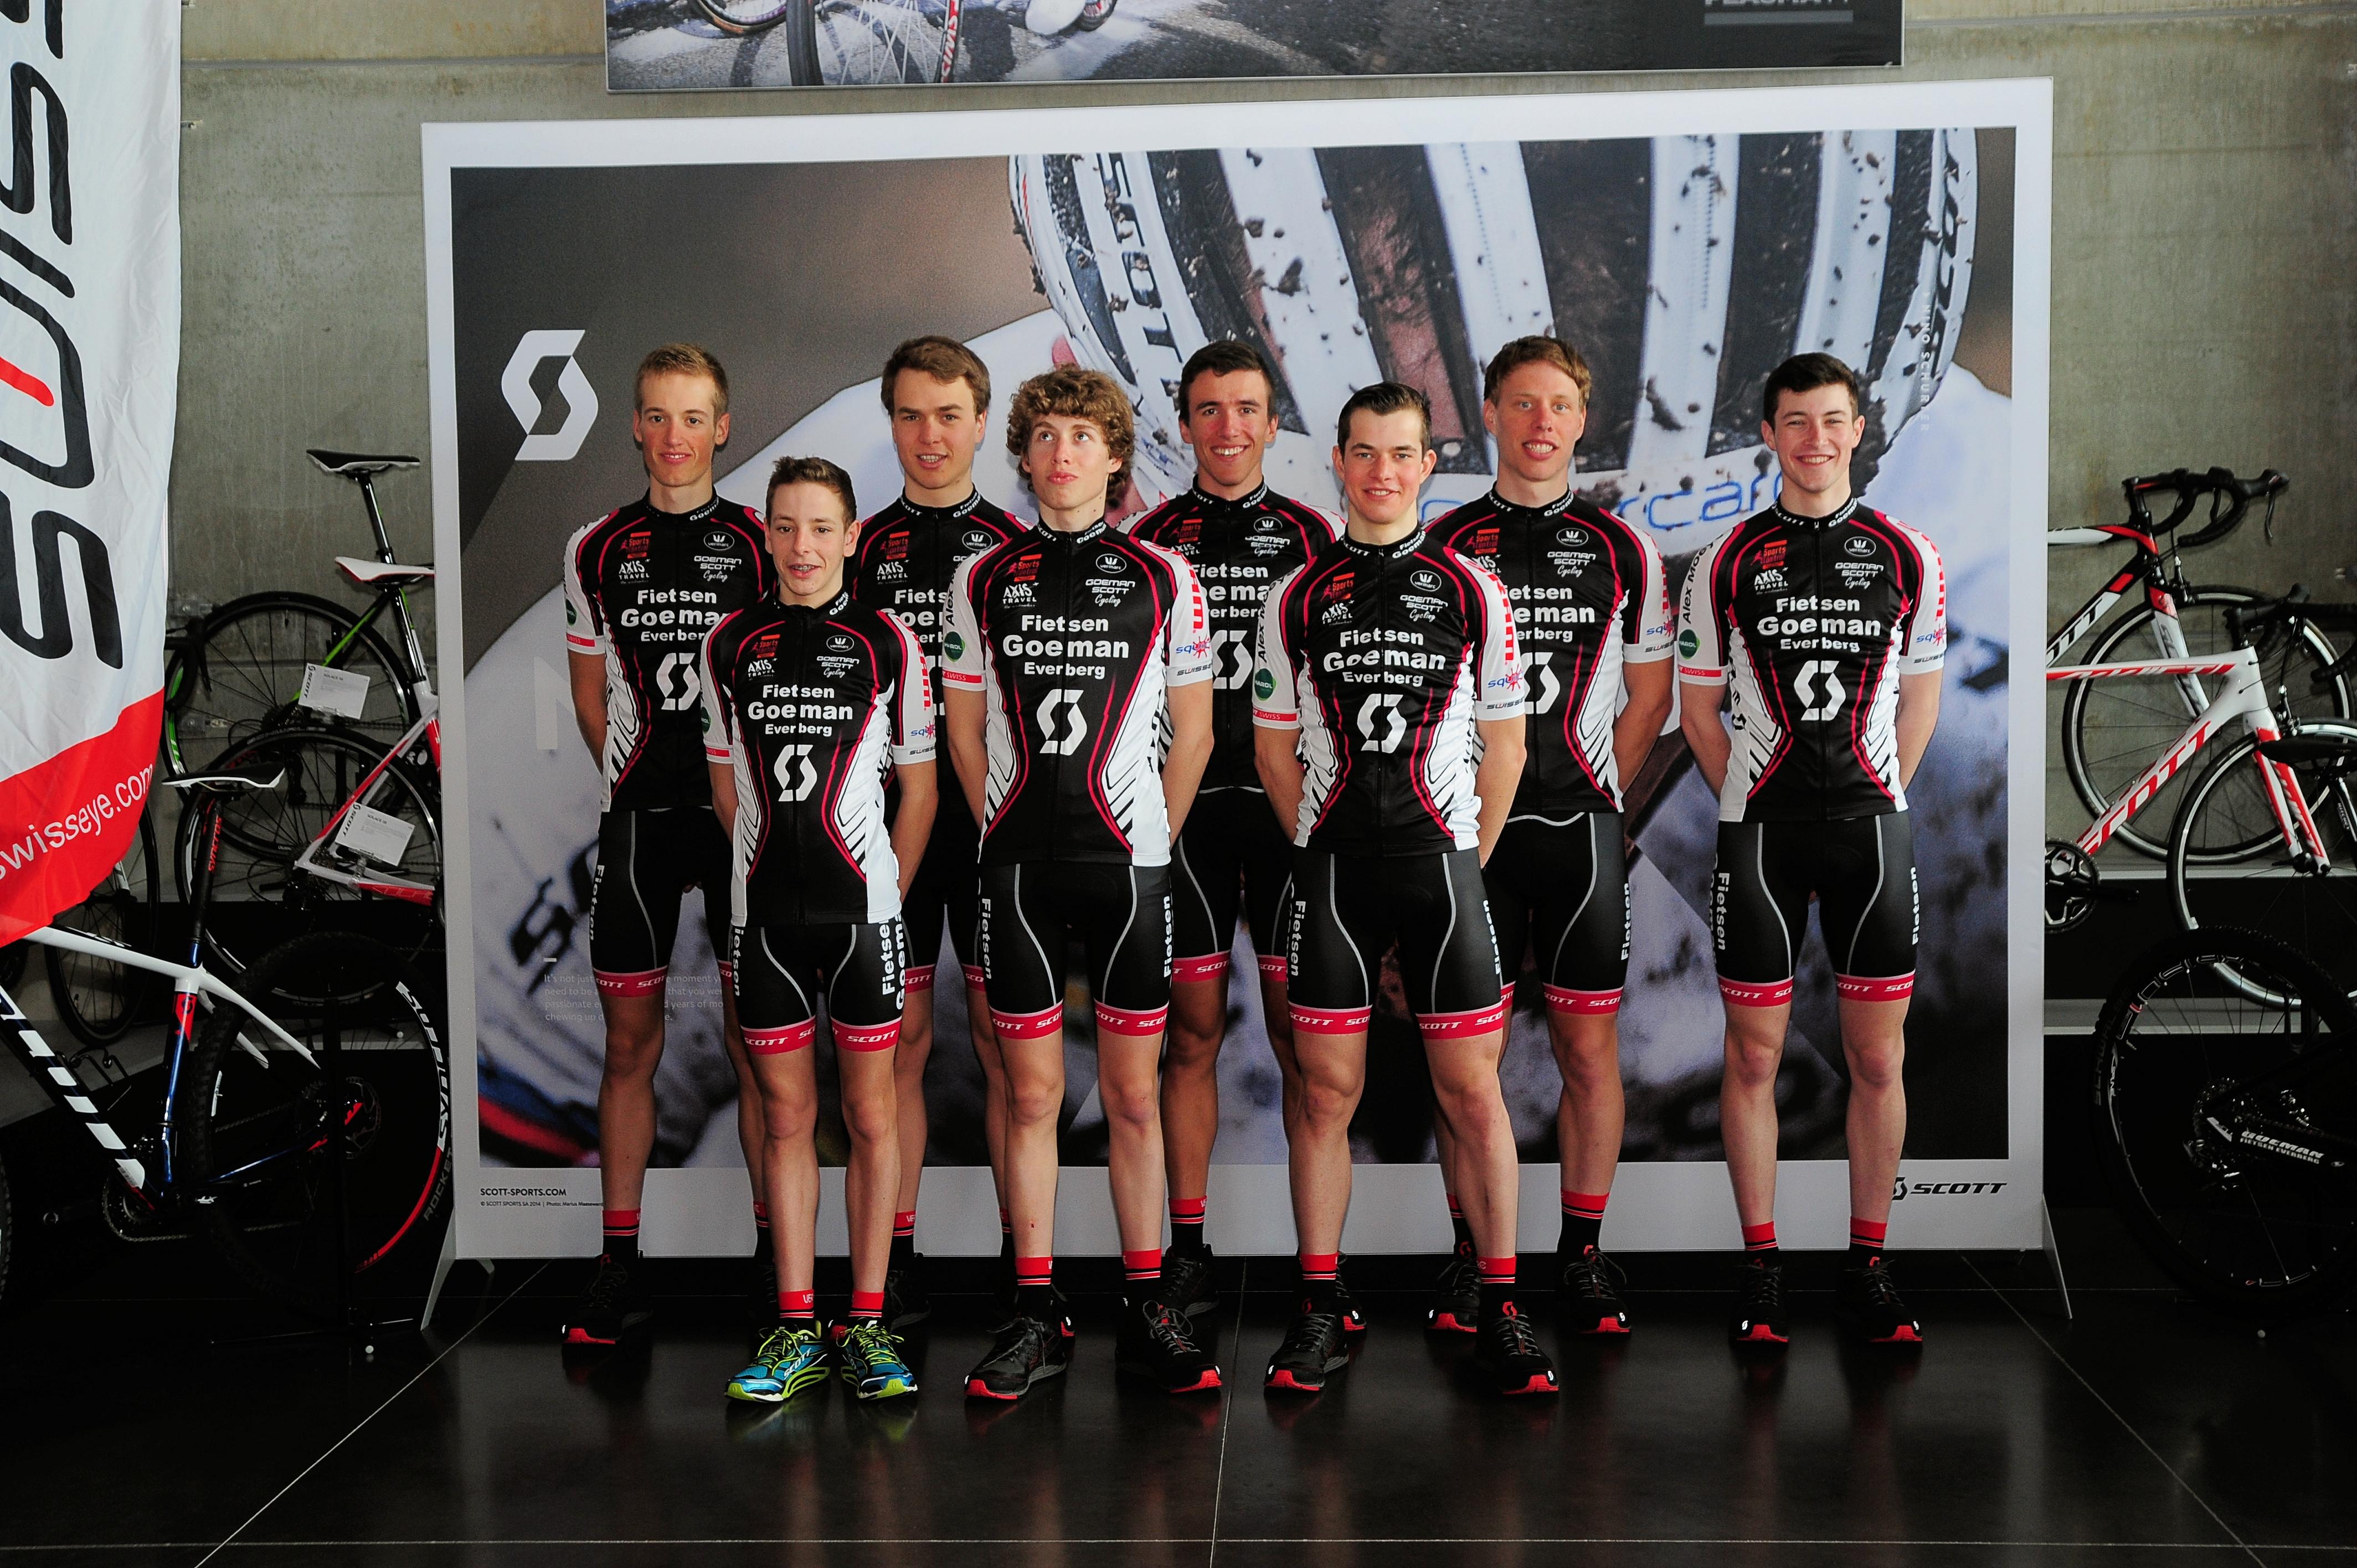 Goeman Scott cyclingteam wil internationaal scoren